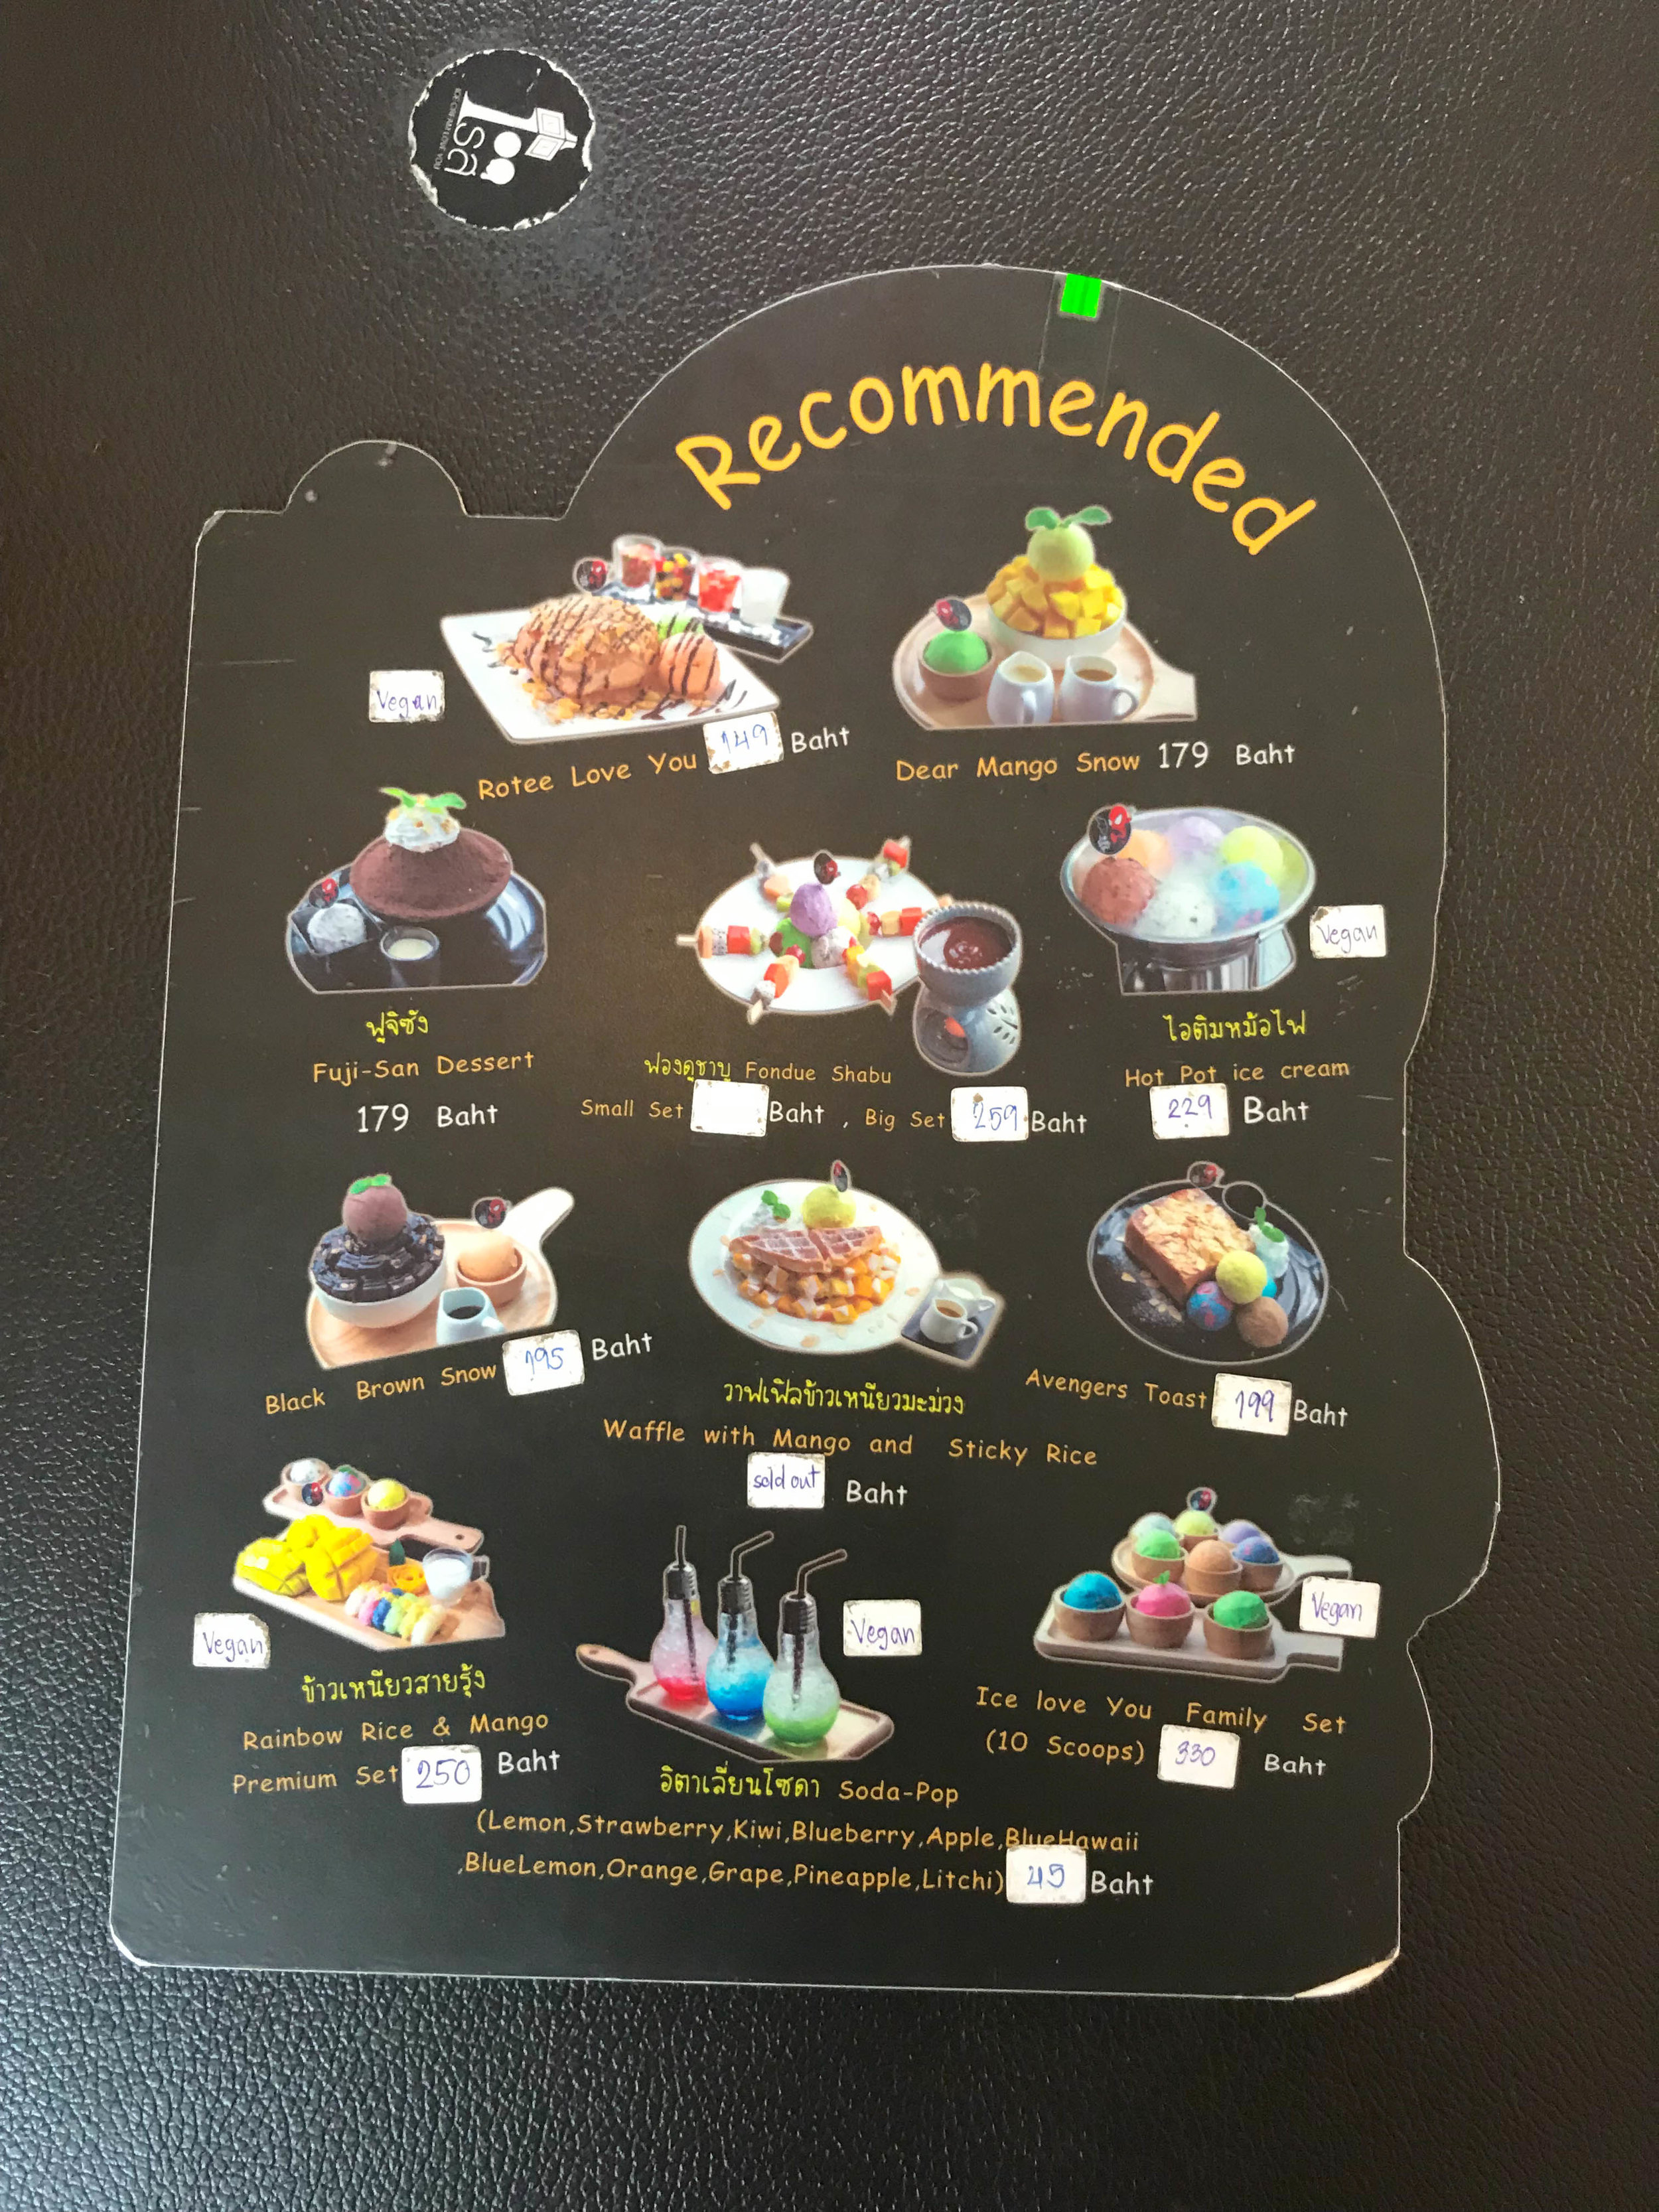 Ice Cream Love you Vegan - Chiang Mai, Thailand - Menu